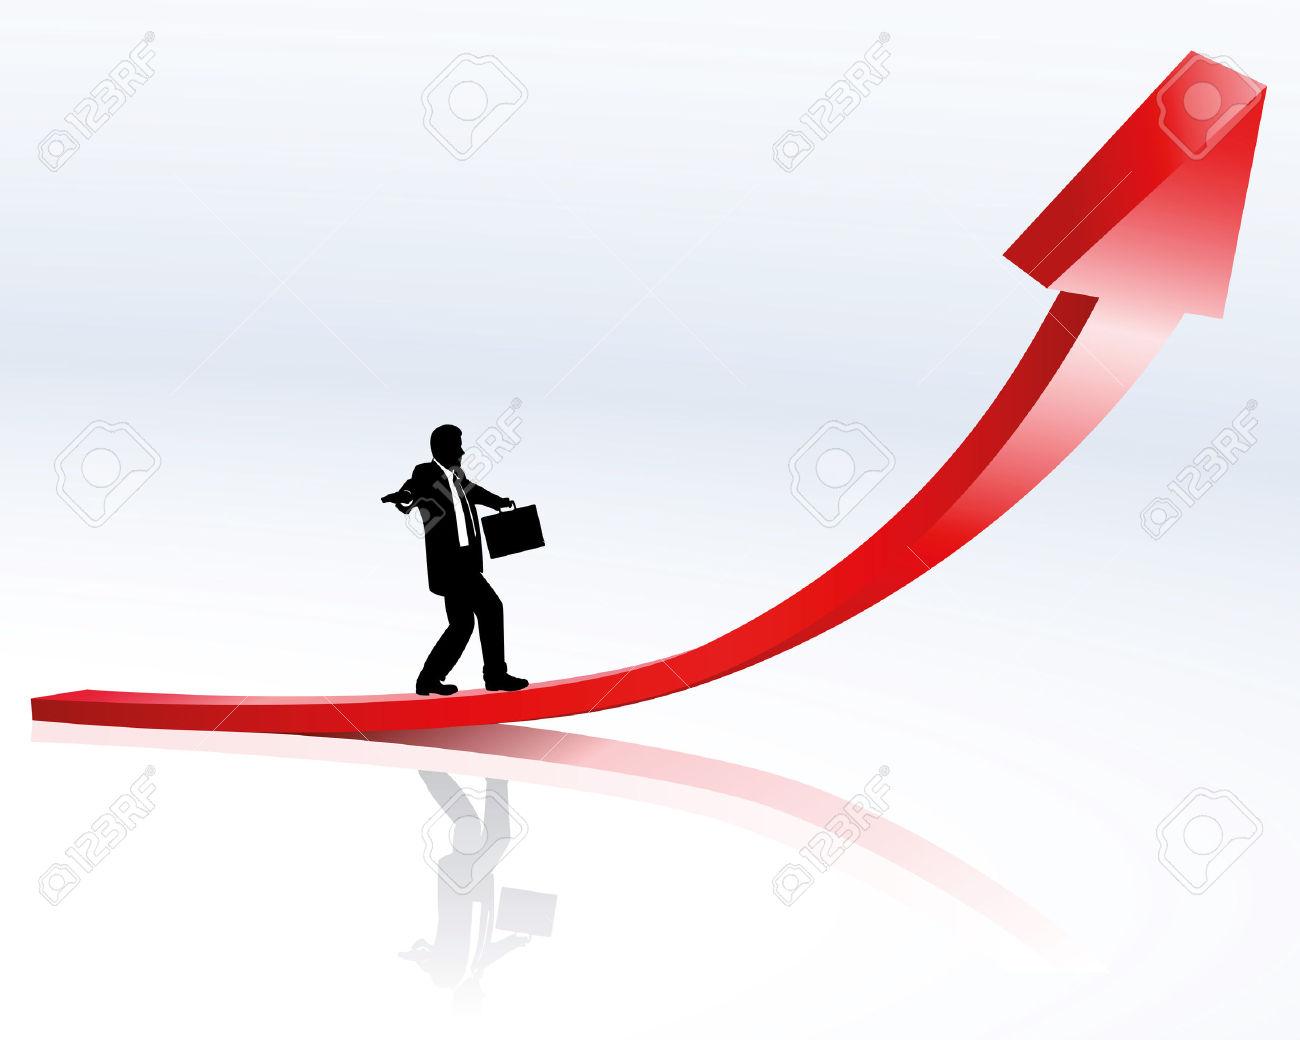 Upward trend clipart freeuse library Upward trend clipart - ClipartFest freeuse library